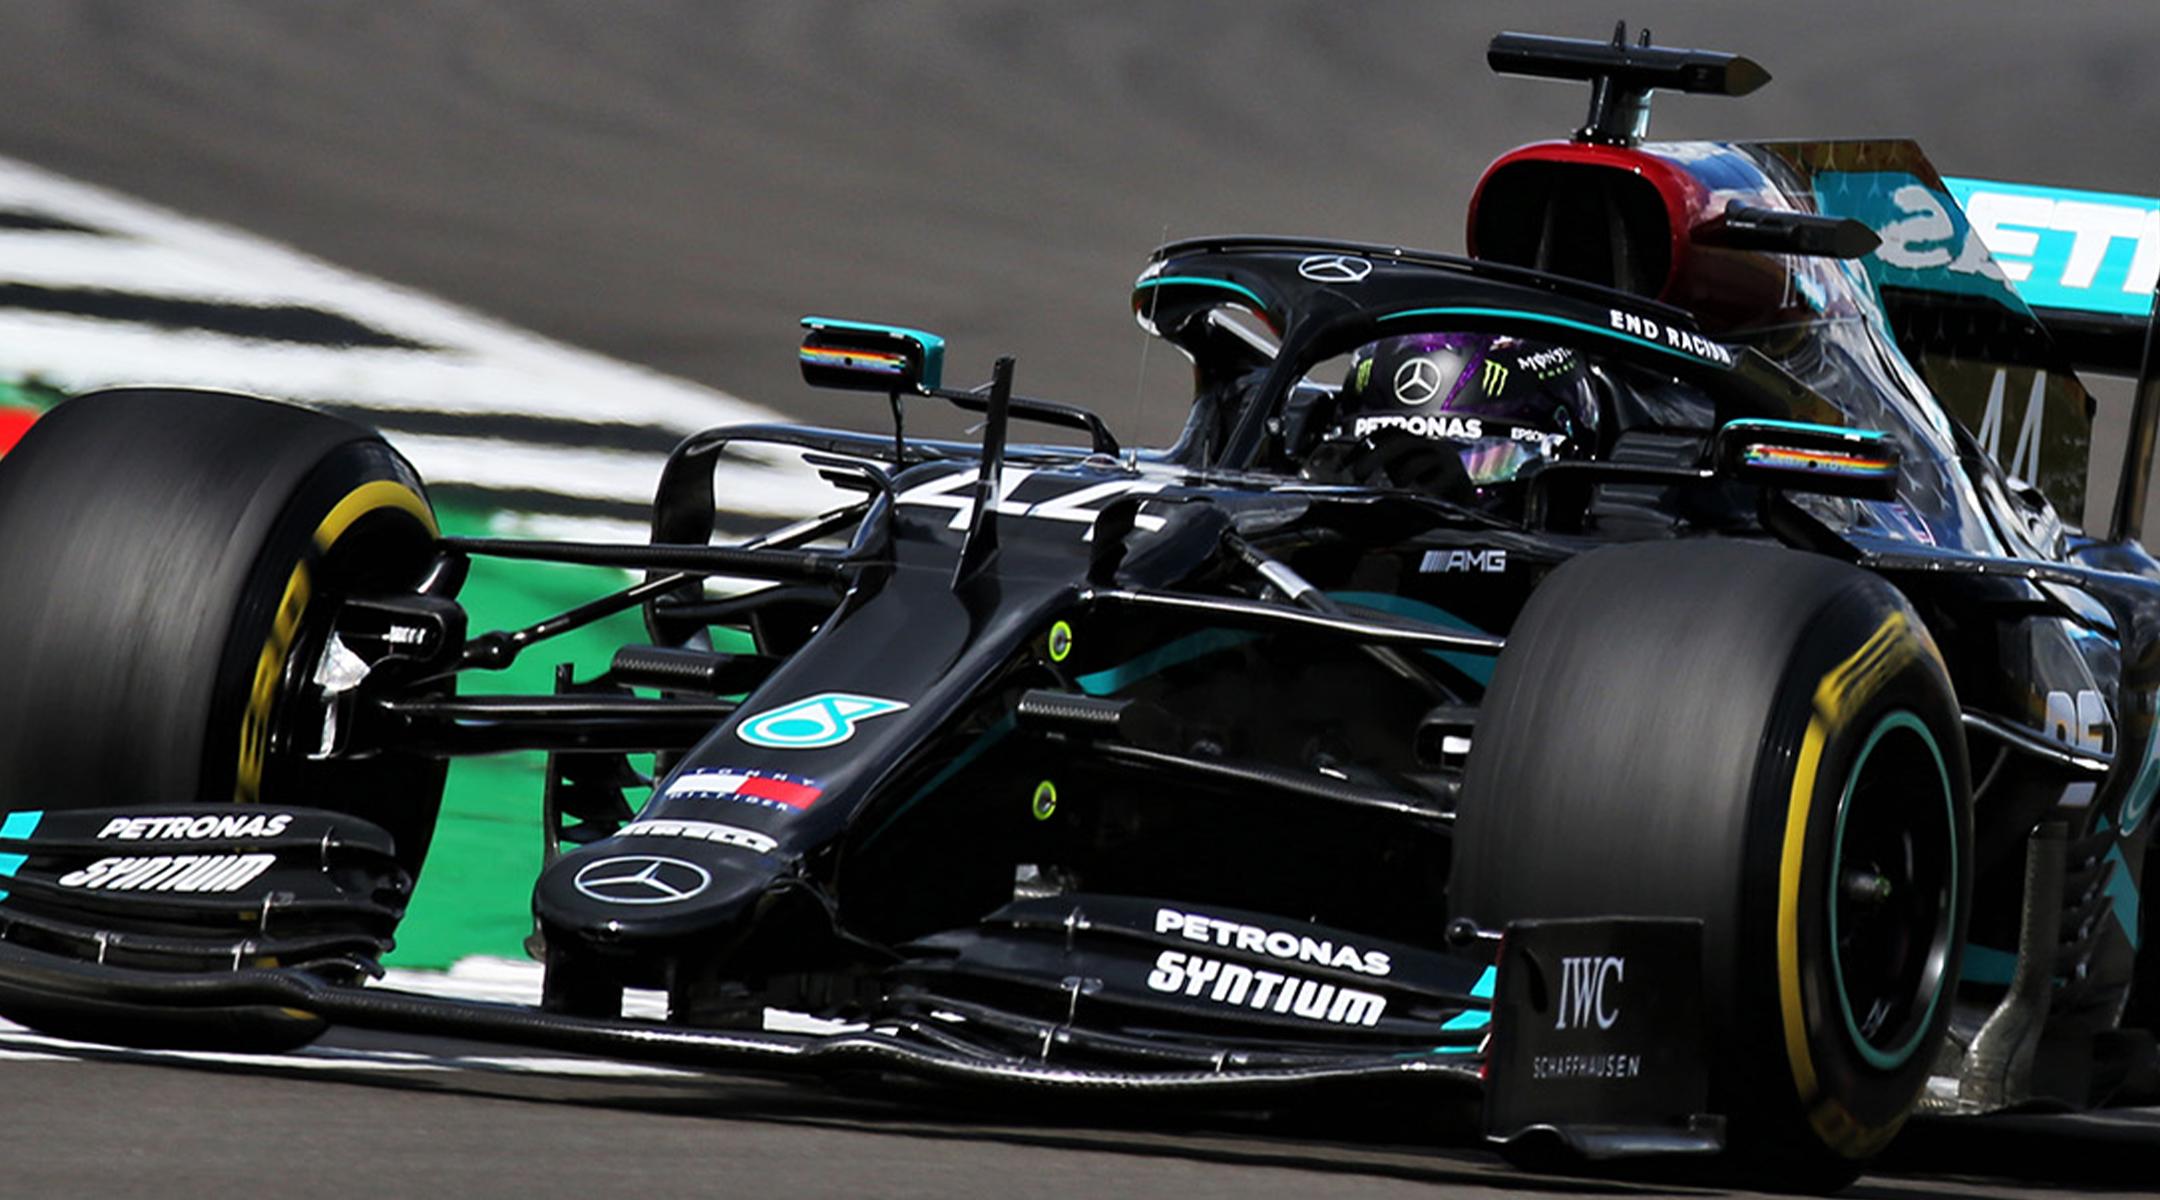 Formula 1 British Grand Prix 2021 - Silverstone- Qualifying